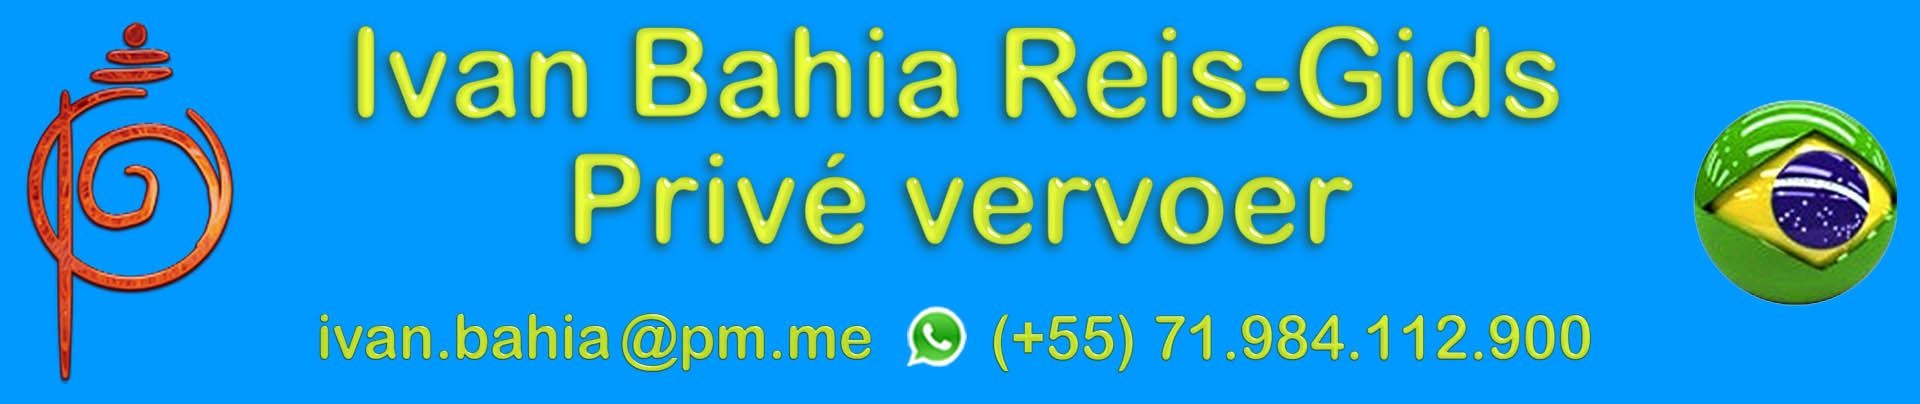 logo Ivan Bahia Logistics, reis & logistieke organisatie voor business men, organisaties, audio-visual producties and research projecten in Bahia / Brazilië #ivanbahiaguide #ivansalvadorbahia #salvadorbahiabrazil #bahiatourism #fotoschapadadiamantina #ibg #ibtg #fotosbahia #salvadorbahiatravel #toursbylocals #ivanbahia #ibg #ibtg #chapadadiamantinatransfer #chapadadiamantina #chapadaexperience #lencoistomorrodesaopaulo #voyagebresil #bresilessentiel #salvadortourguide #chapadadiamantinatrekking #lencois #lençois #toursbahia #brazilhoneymoon #yourtourbrazil #yourtoursbrazil #ig_bahia #bahiatours #reconcavobaiano #bahiaguide  #citytoursalvador #bahiametisse #guidedetourismesalvadorbahiabresil #transatjacquesvabres #sailingbrazil #yourtoursbrazil #maurotours #bahiatopturismo #gaytravelbrazil  #transfersalvador #morrodopaiinacio #FotosChapadaDiamantina #BahiaTourism #SalvadorBahiaBrazil #FotosBahia #SalvadorBahiaTravel #tripadvisorsalvador #tripadvisorbahia #bahiatour #toursbahia #bahiatravel #salvadortourguide #fotosbahia #ssalovers